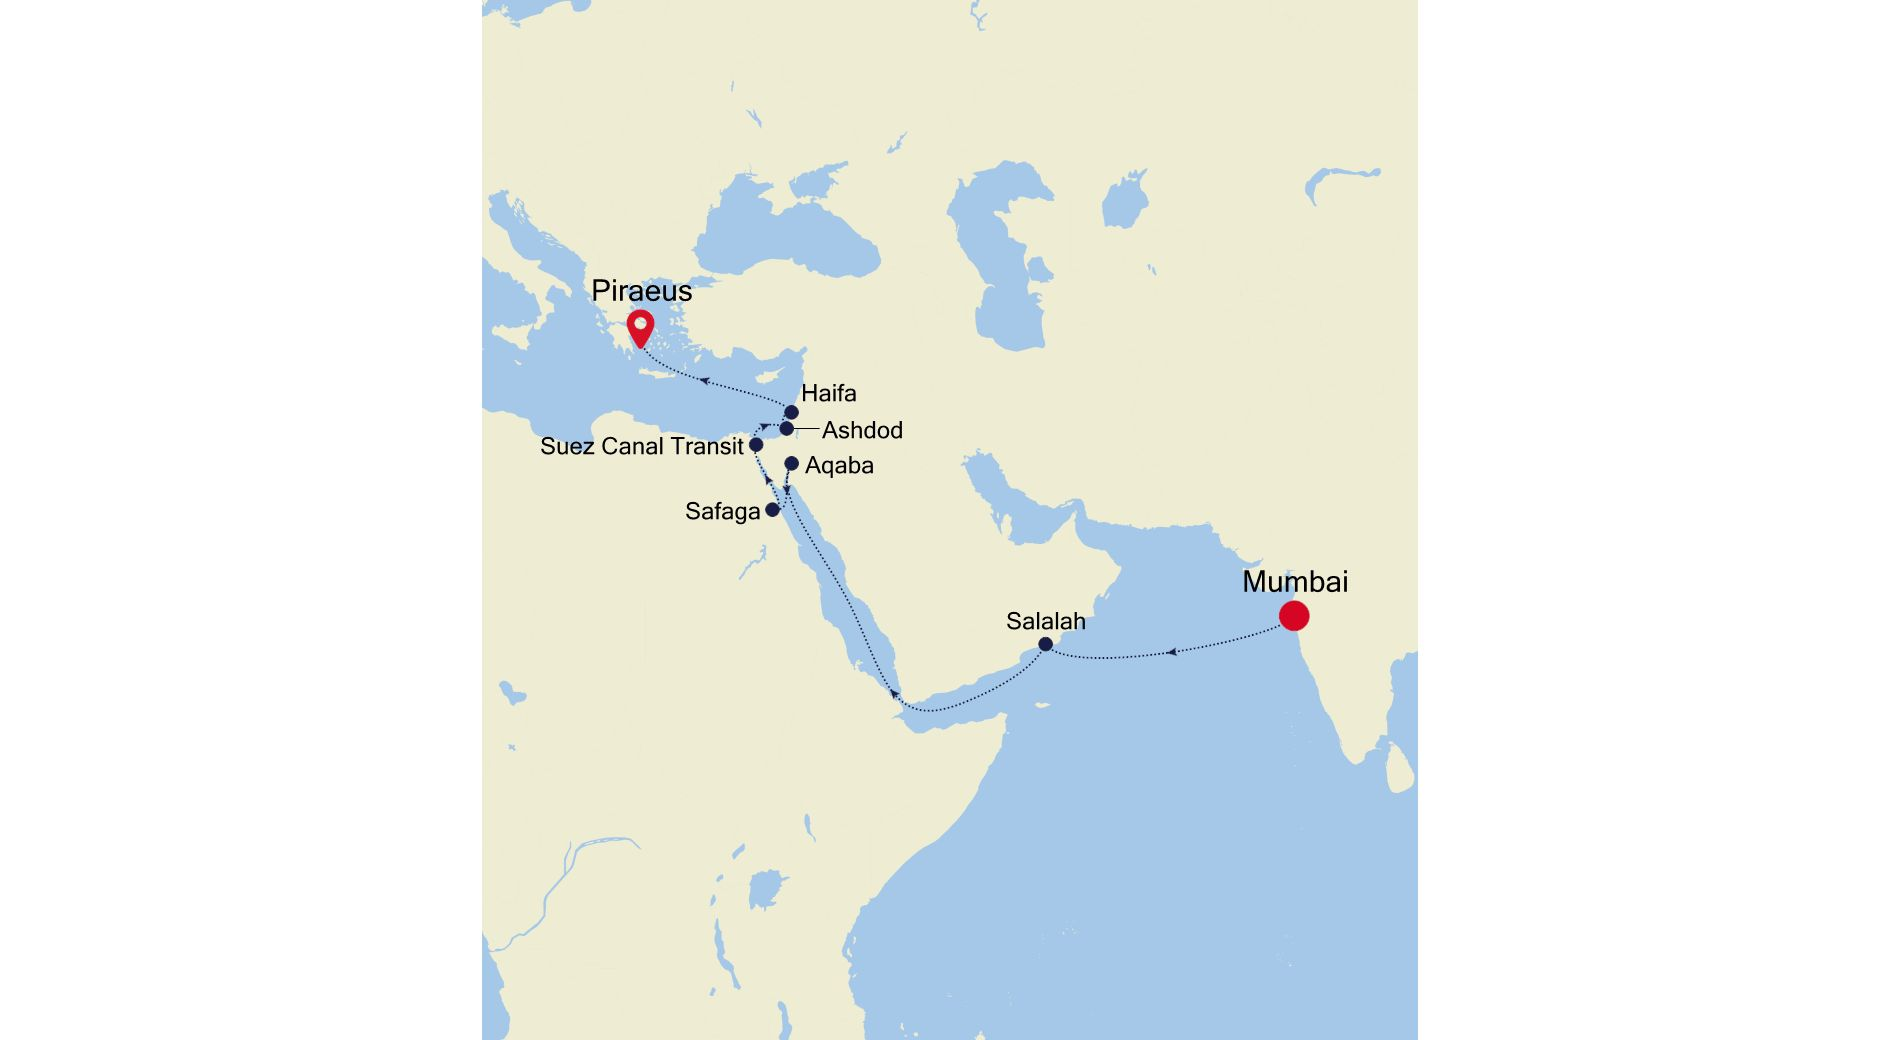 WH210423017 - Mumbai nach Piraeus